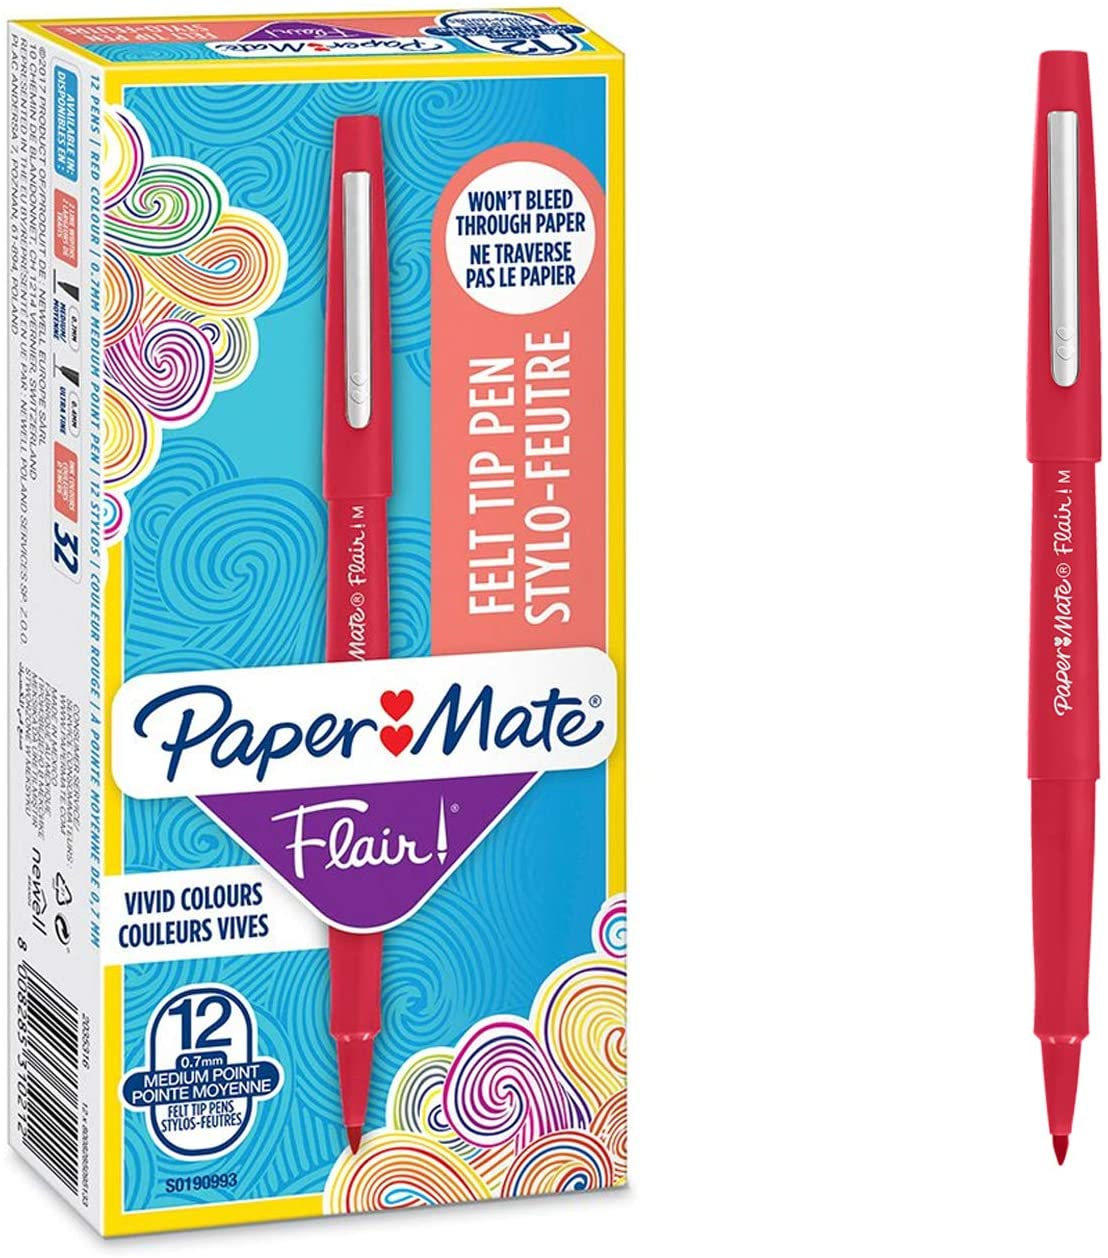 Caja de 12 rotuladores Paper Mate Flair